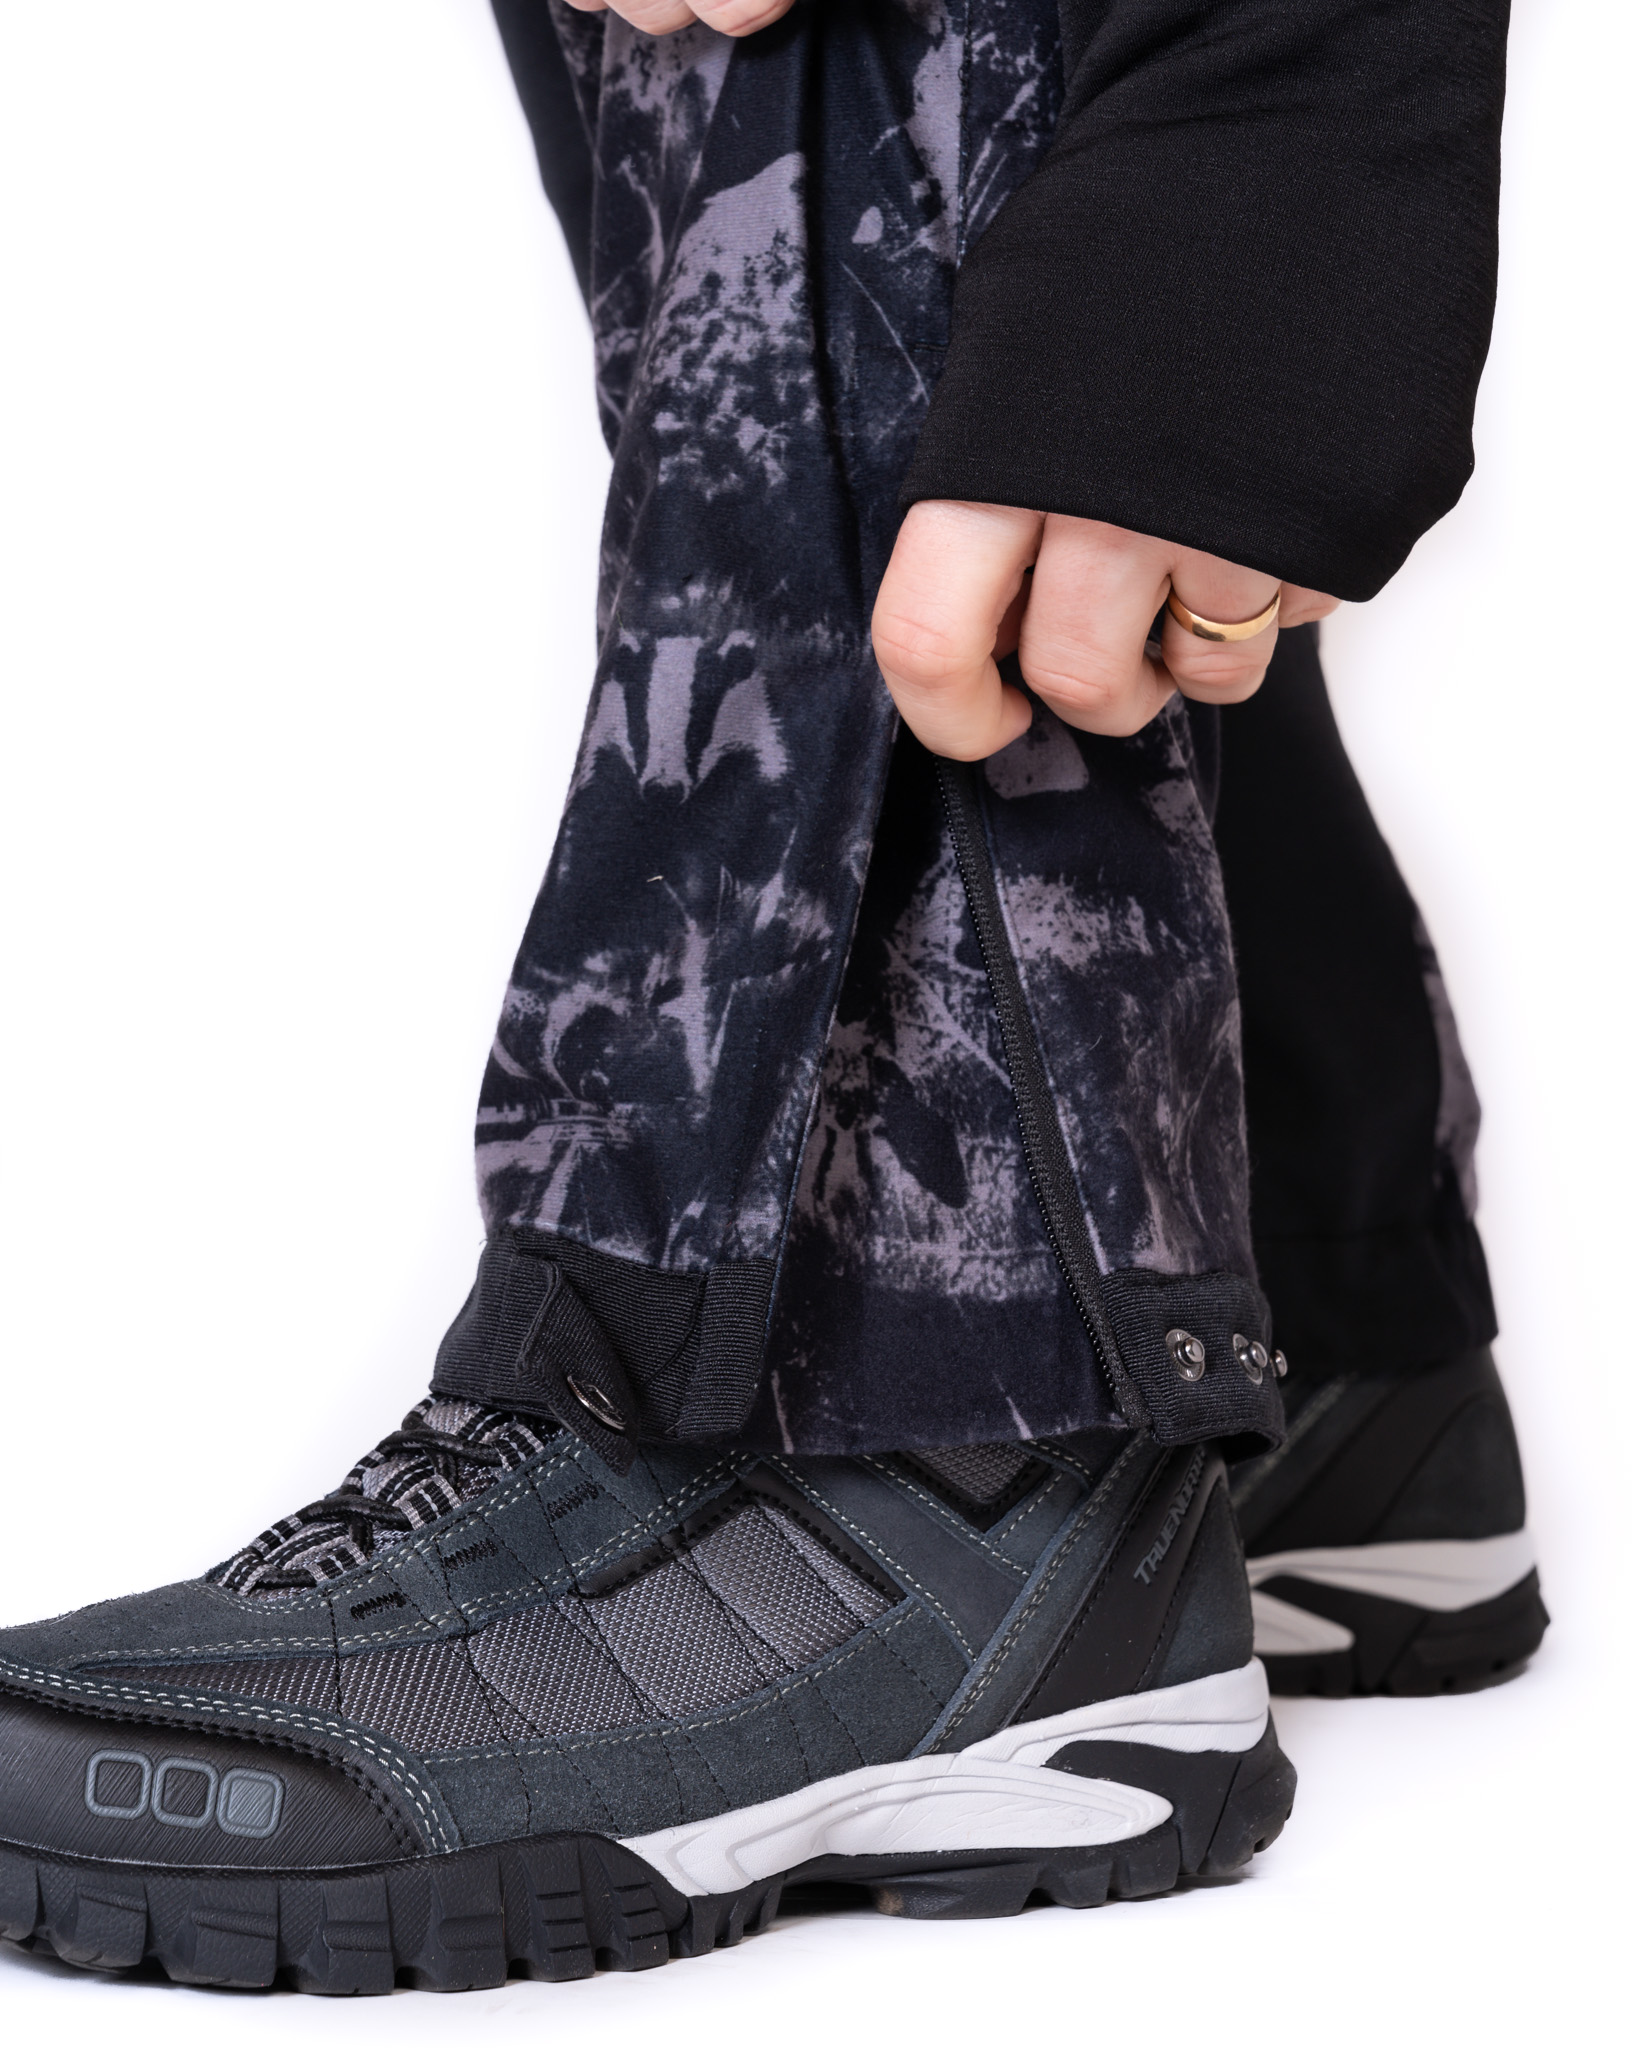 Jaktställ Camouflage Herr, Hunters Elite Black Camo